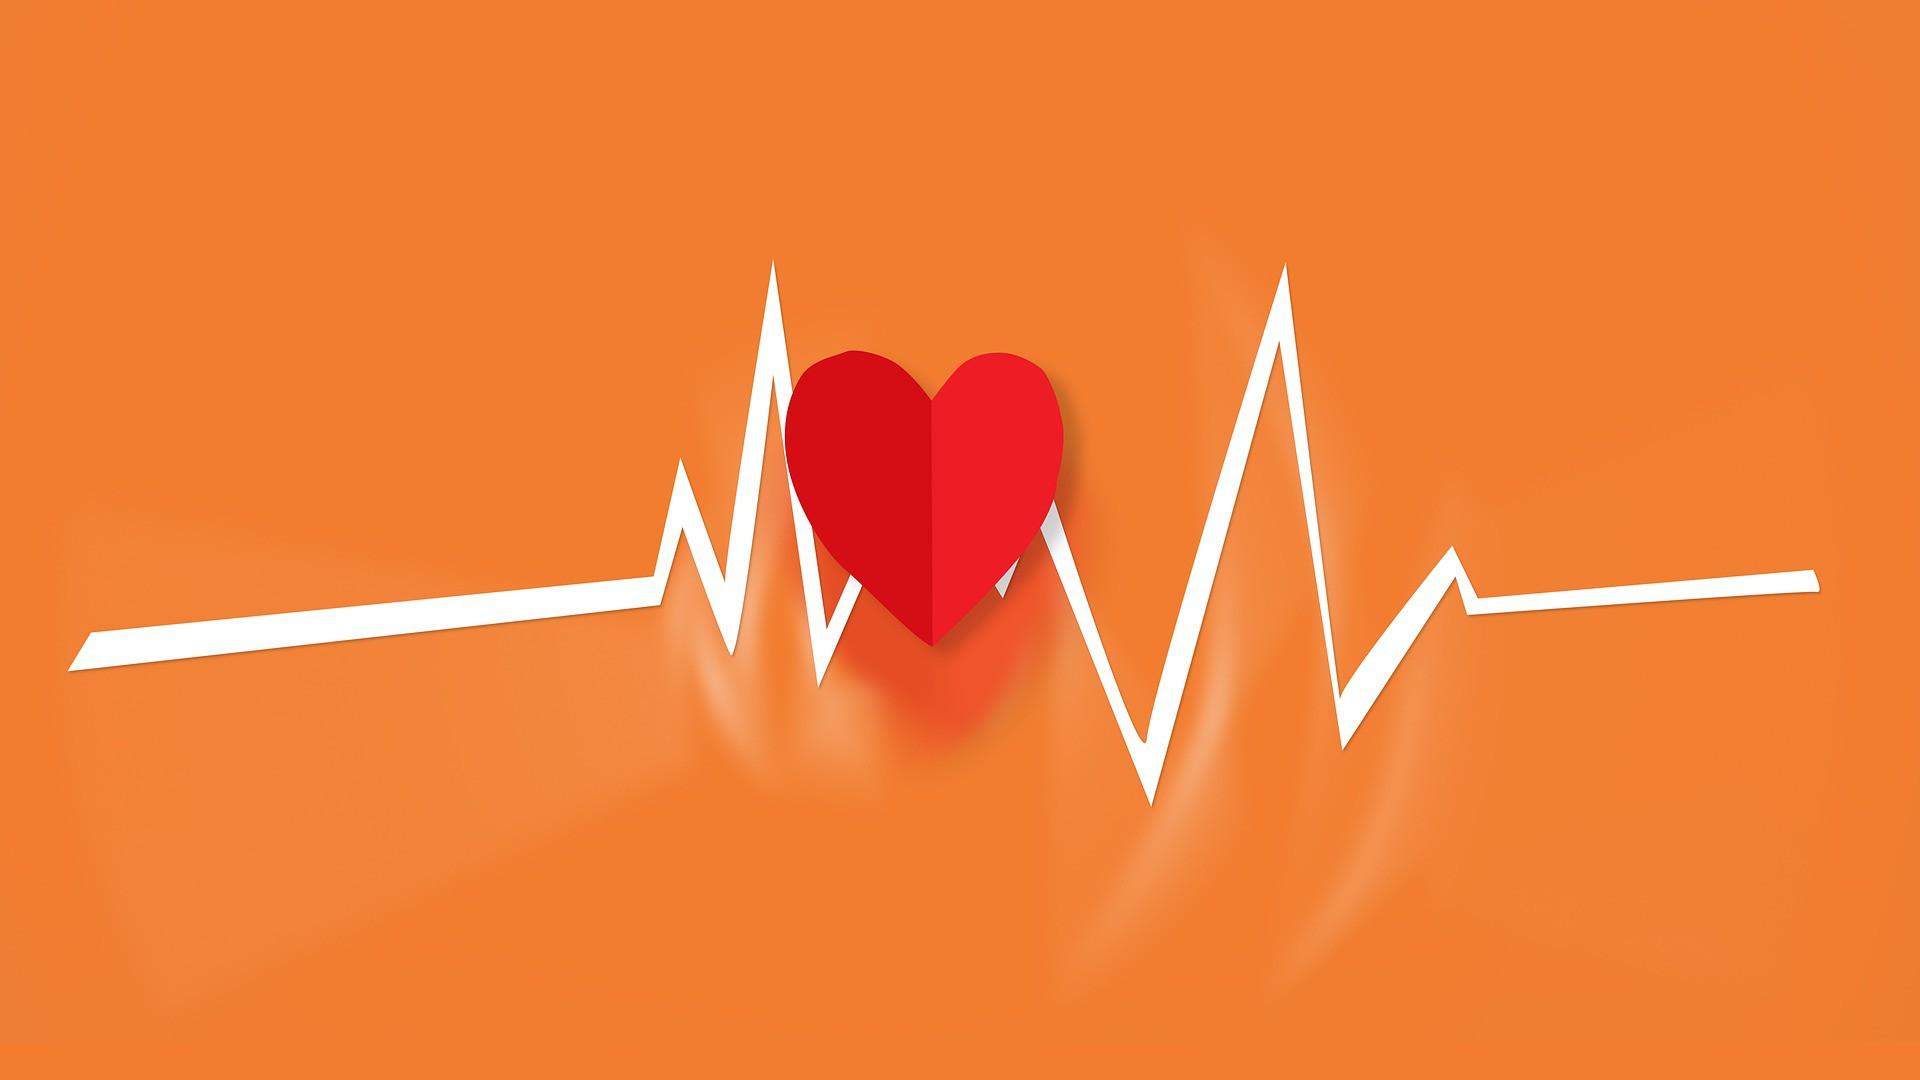 bionicke srdce srdcova pumpa bezdrotove nabijanie lekarsky prevrat